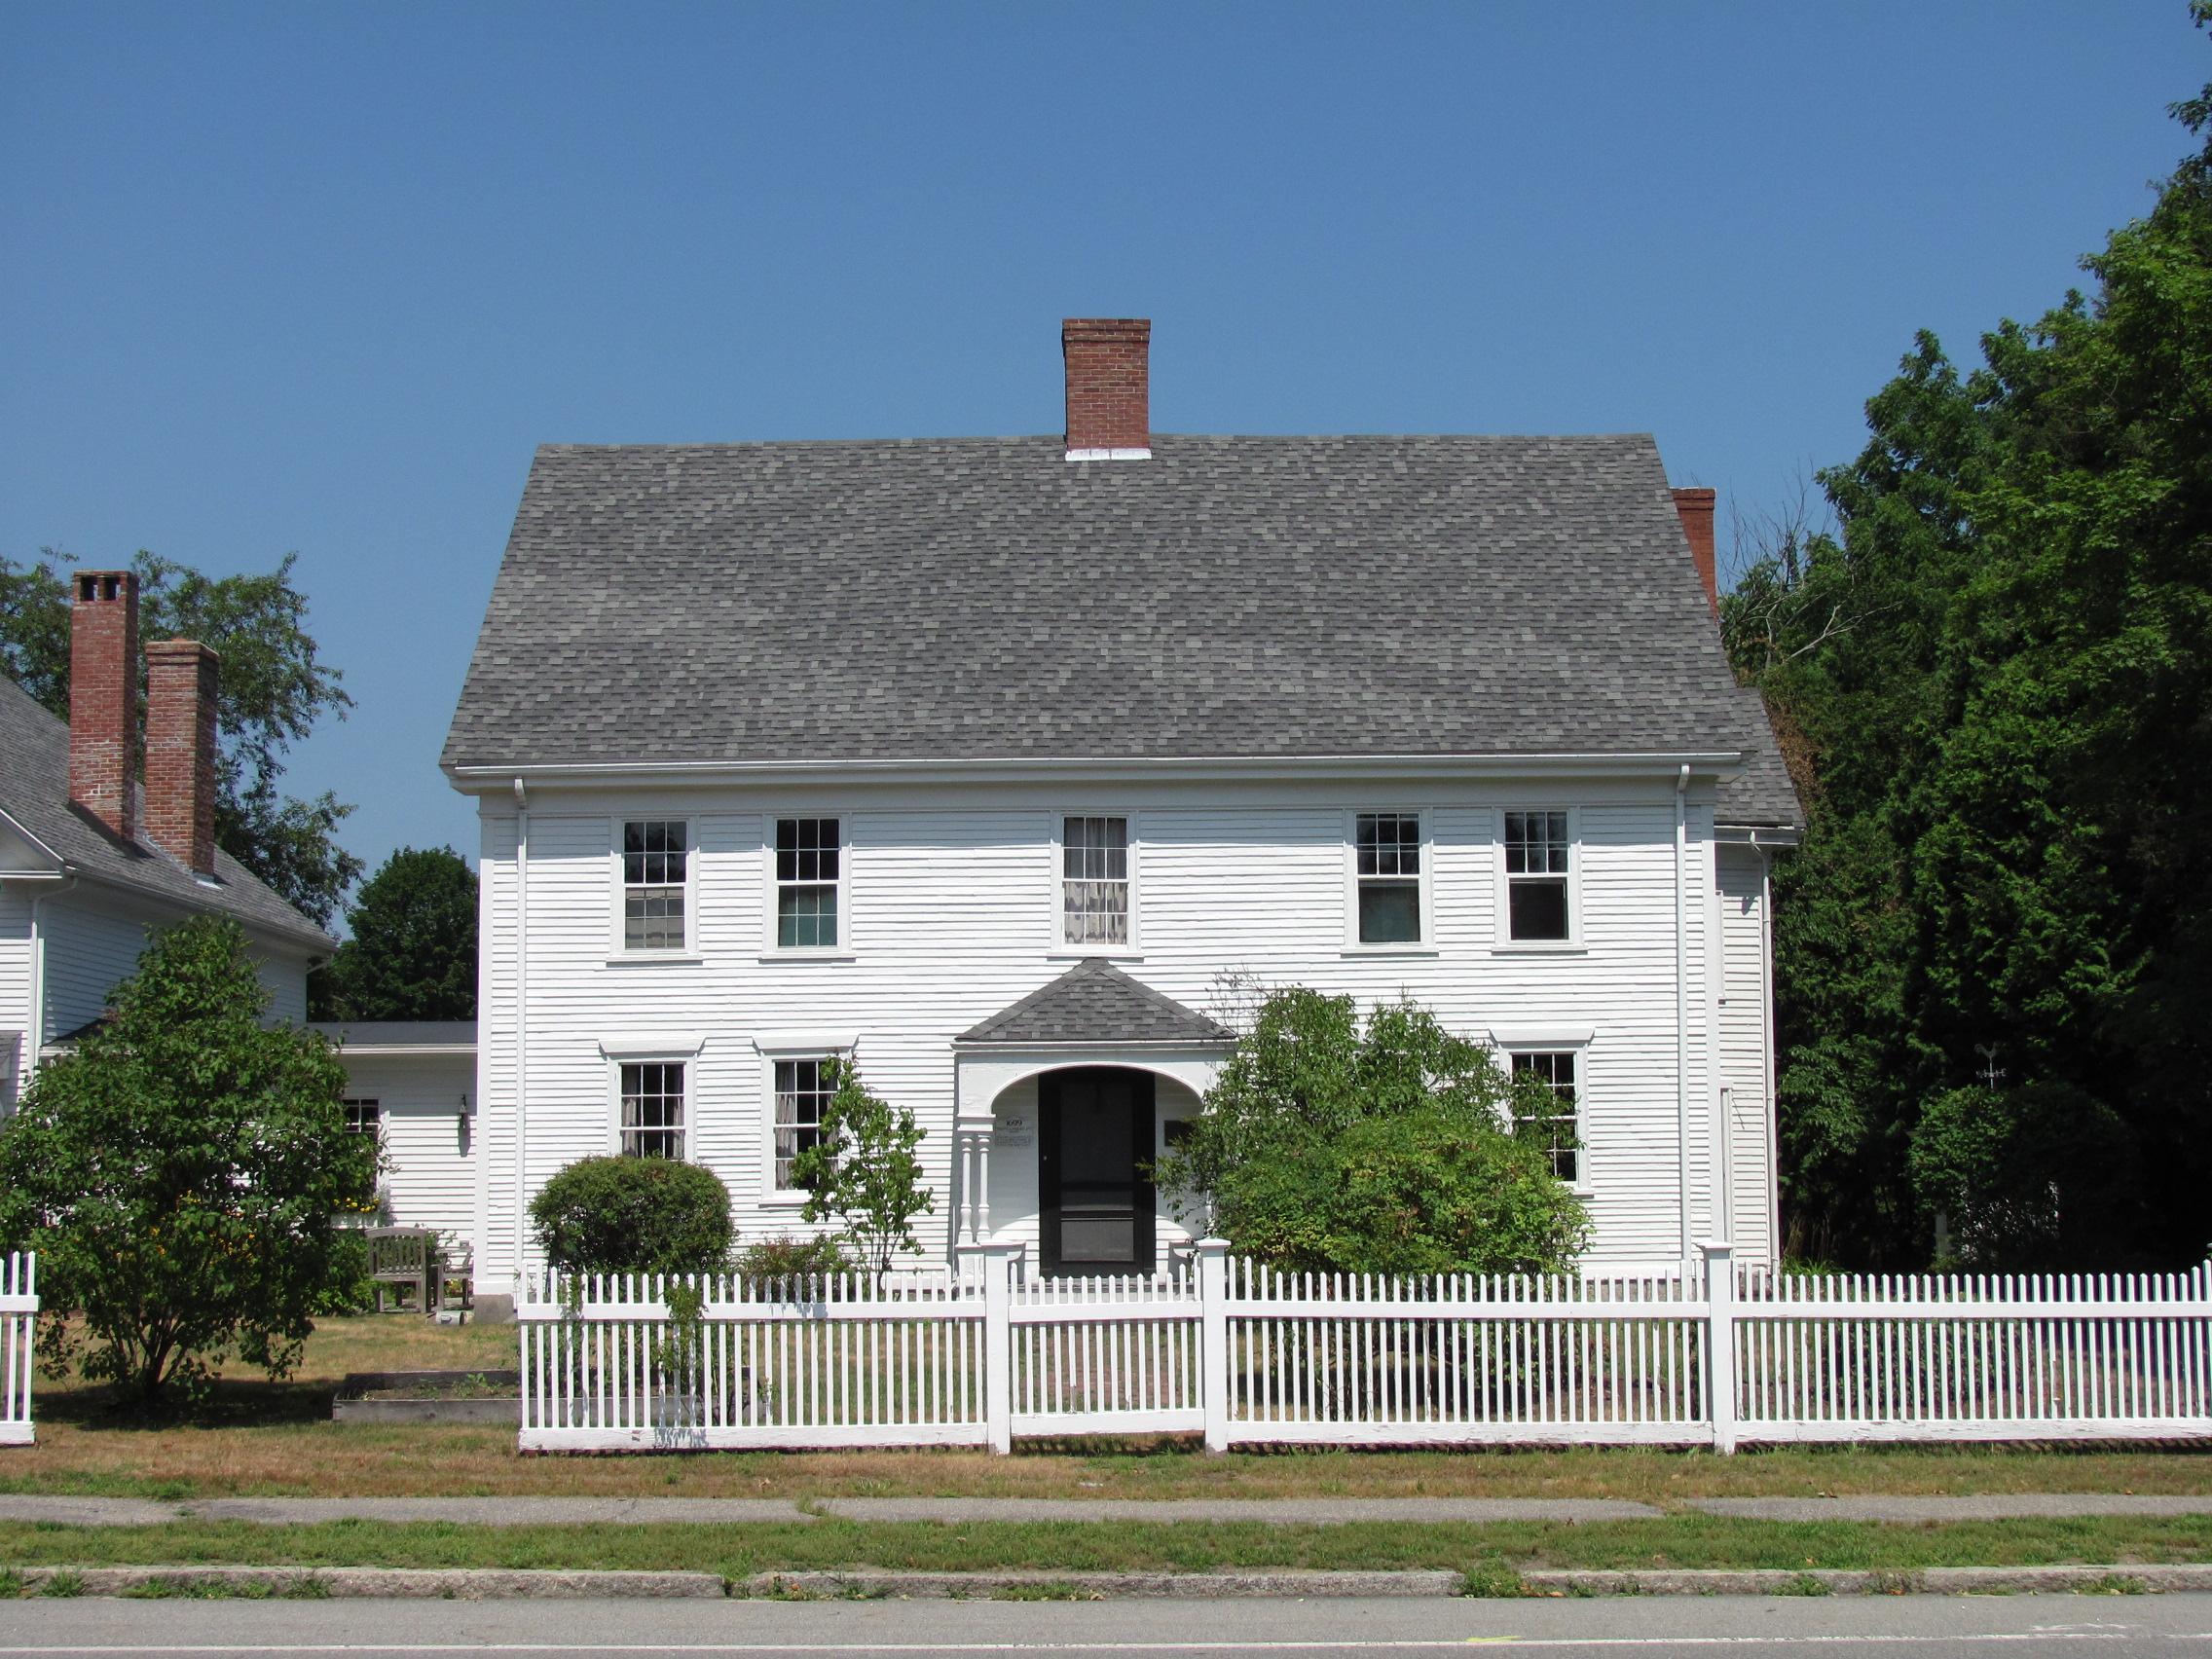 datei thomas lambert house rowley wikipedia. Black Bedroom Furniture Sets. Home Design Ideas